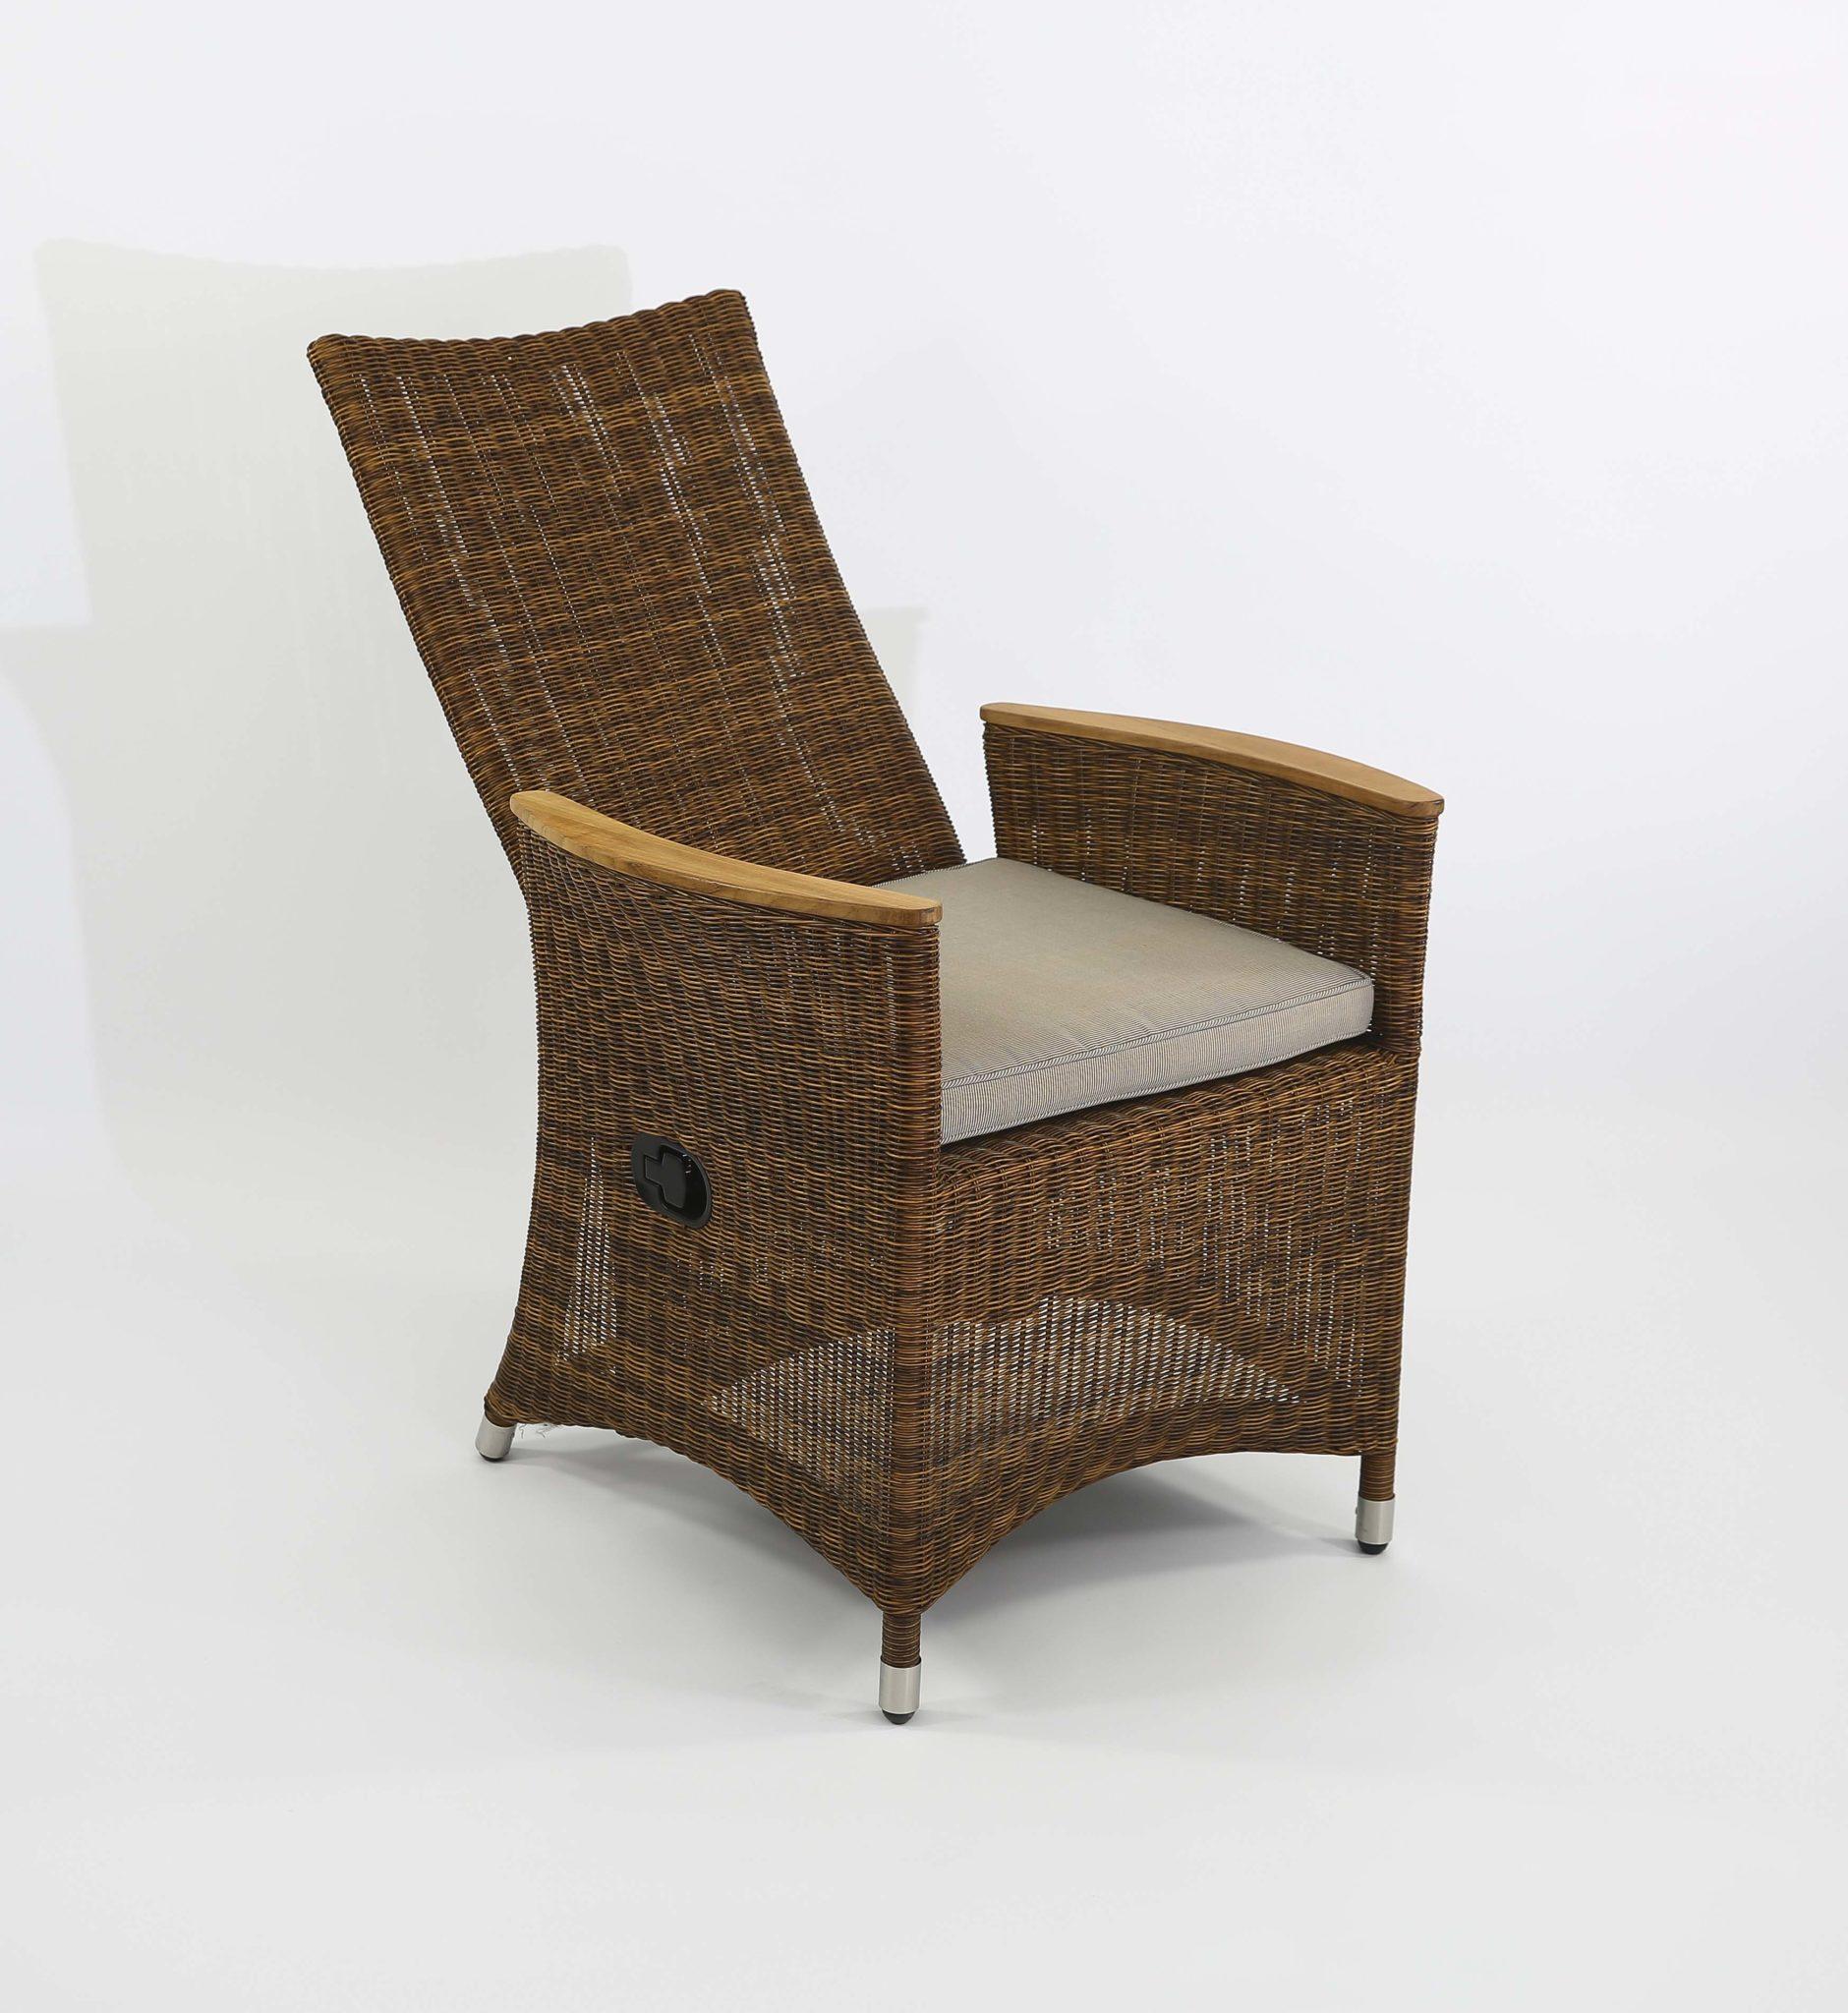 carma relax theben geflecht bumb gartenm bel karlsruhe. Black Bedroom Furniture Sets. Home Design Ideas